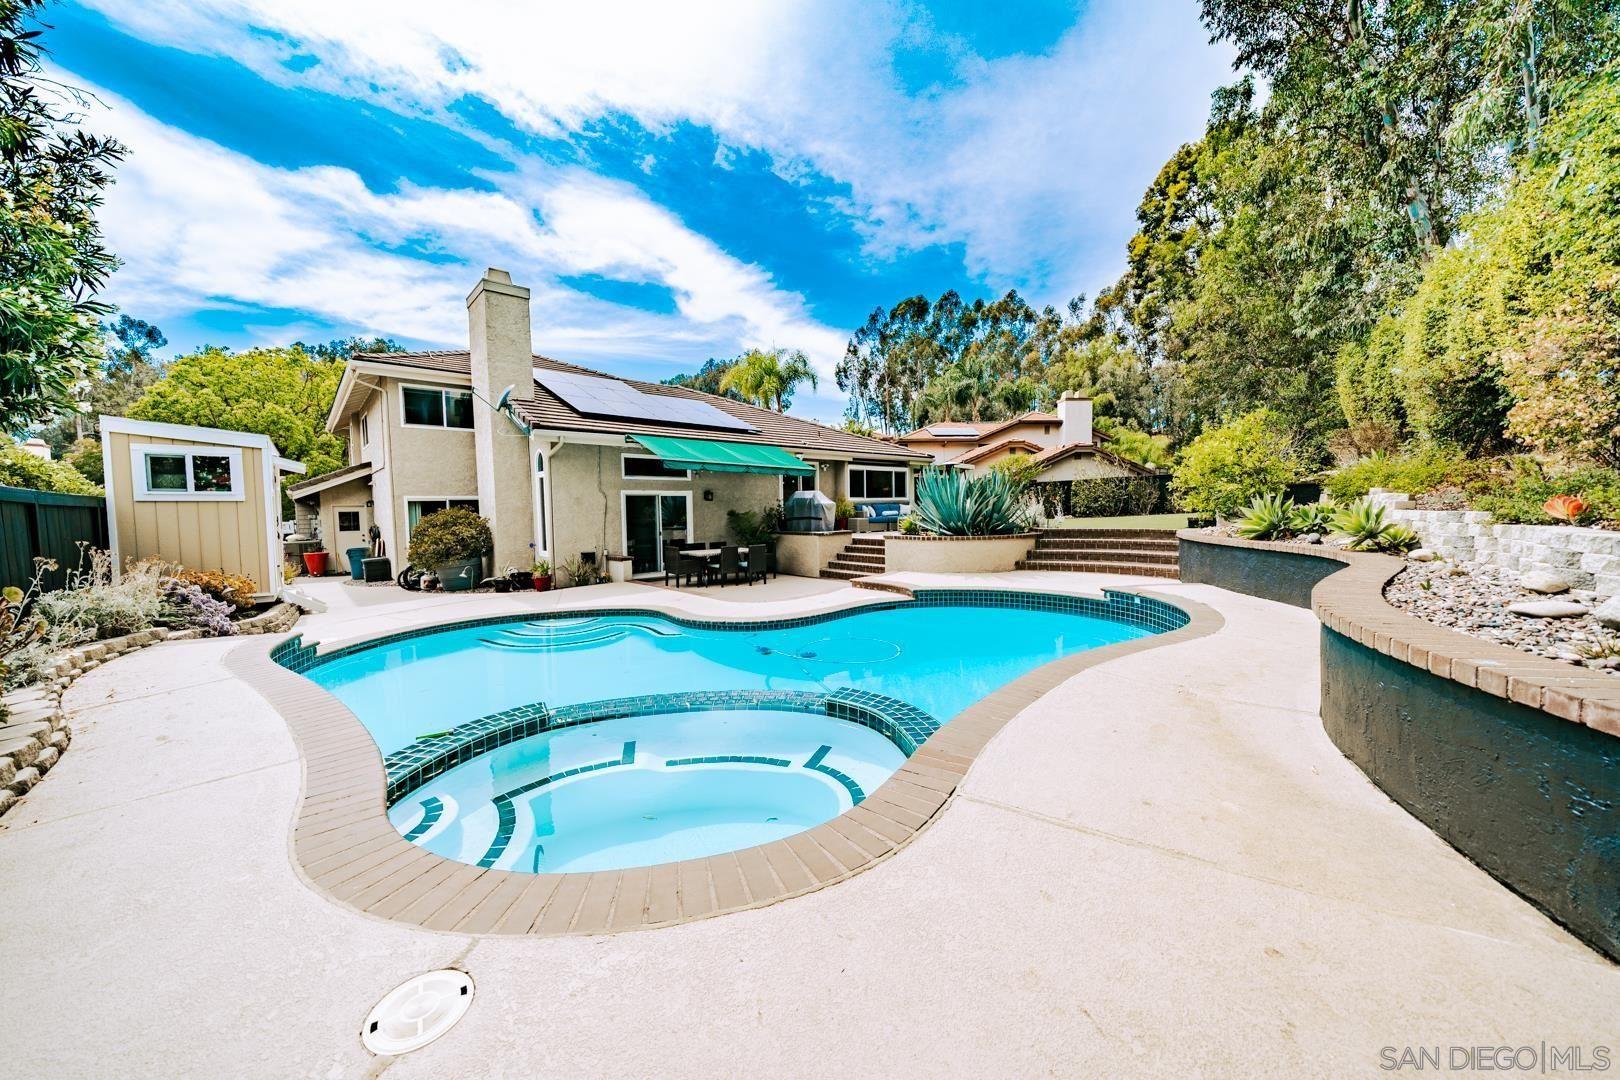 Photo of 10525 Quail Springs Ct, San Diego, CA 92131 (MLS # 210021747)